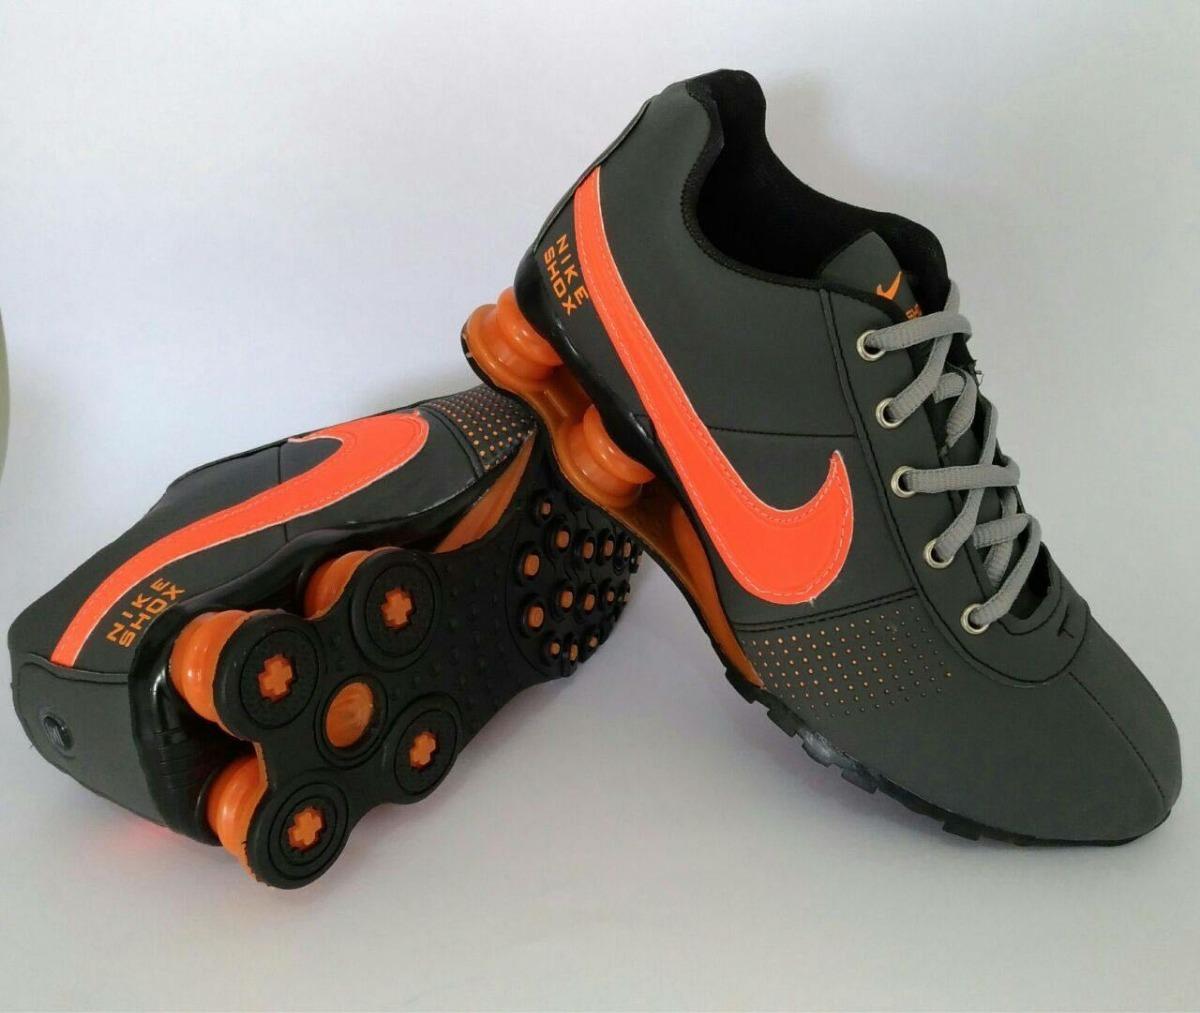 ... professional sale f402f ce2eb ... tênis nike shox 4 molas cinza  laranja. carregando ... d0a61856017e1